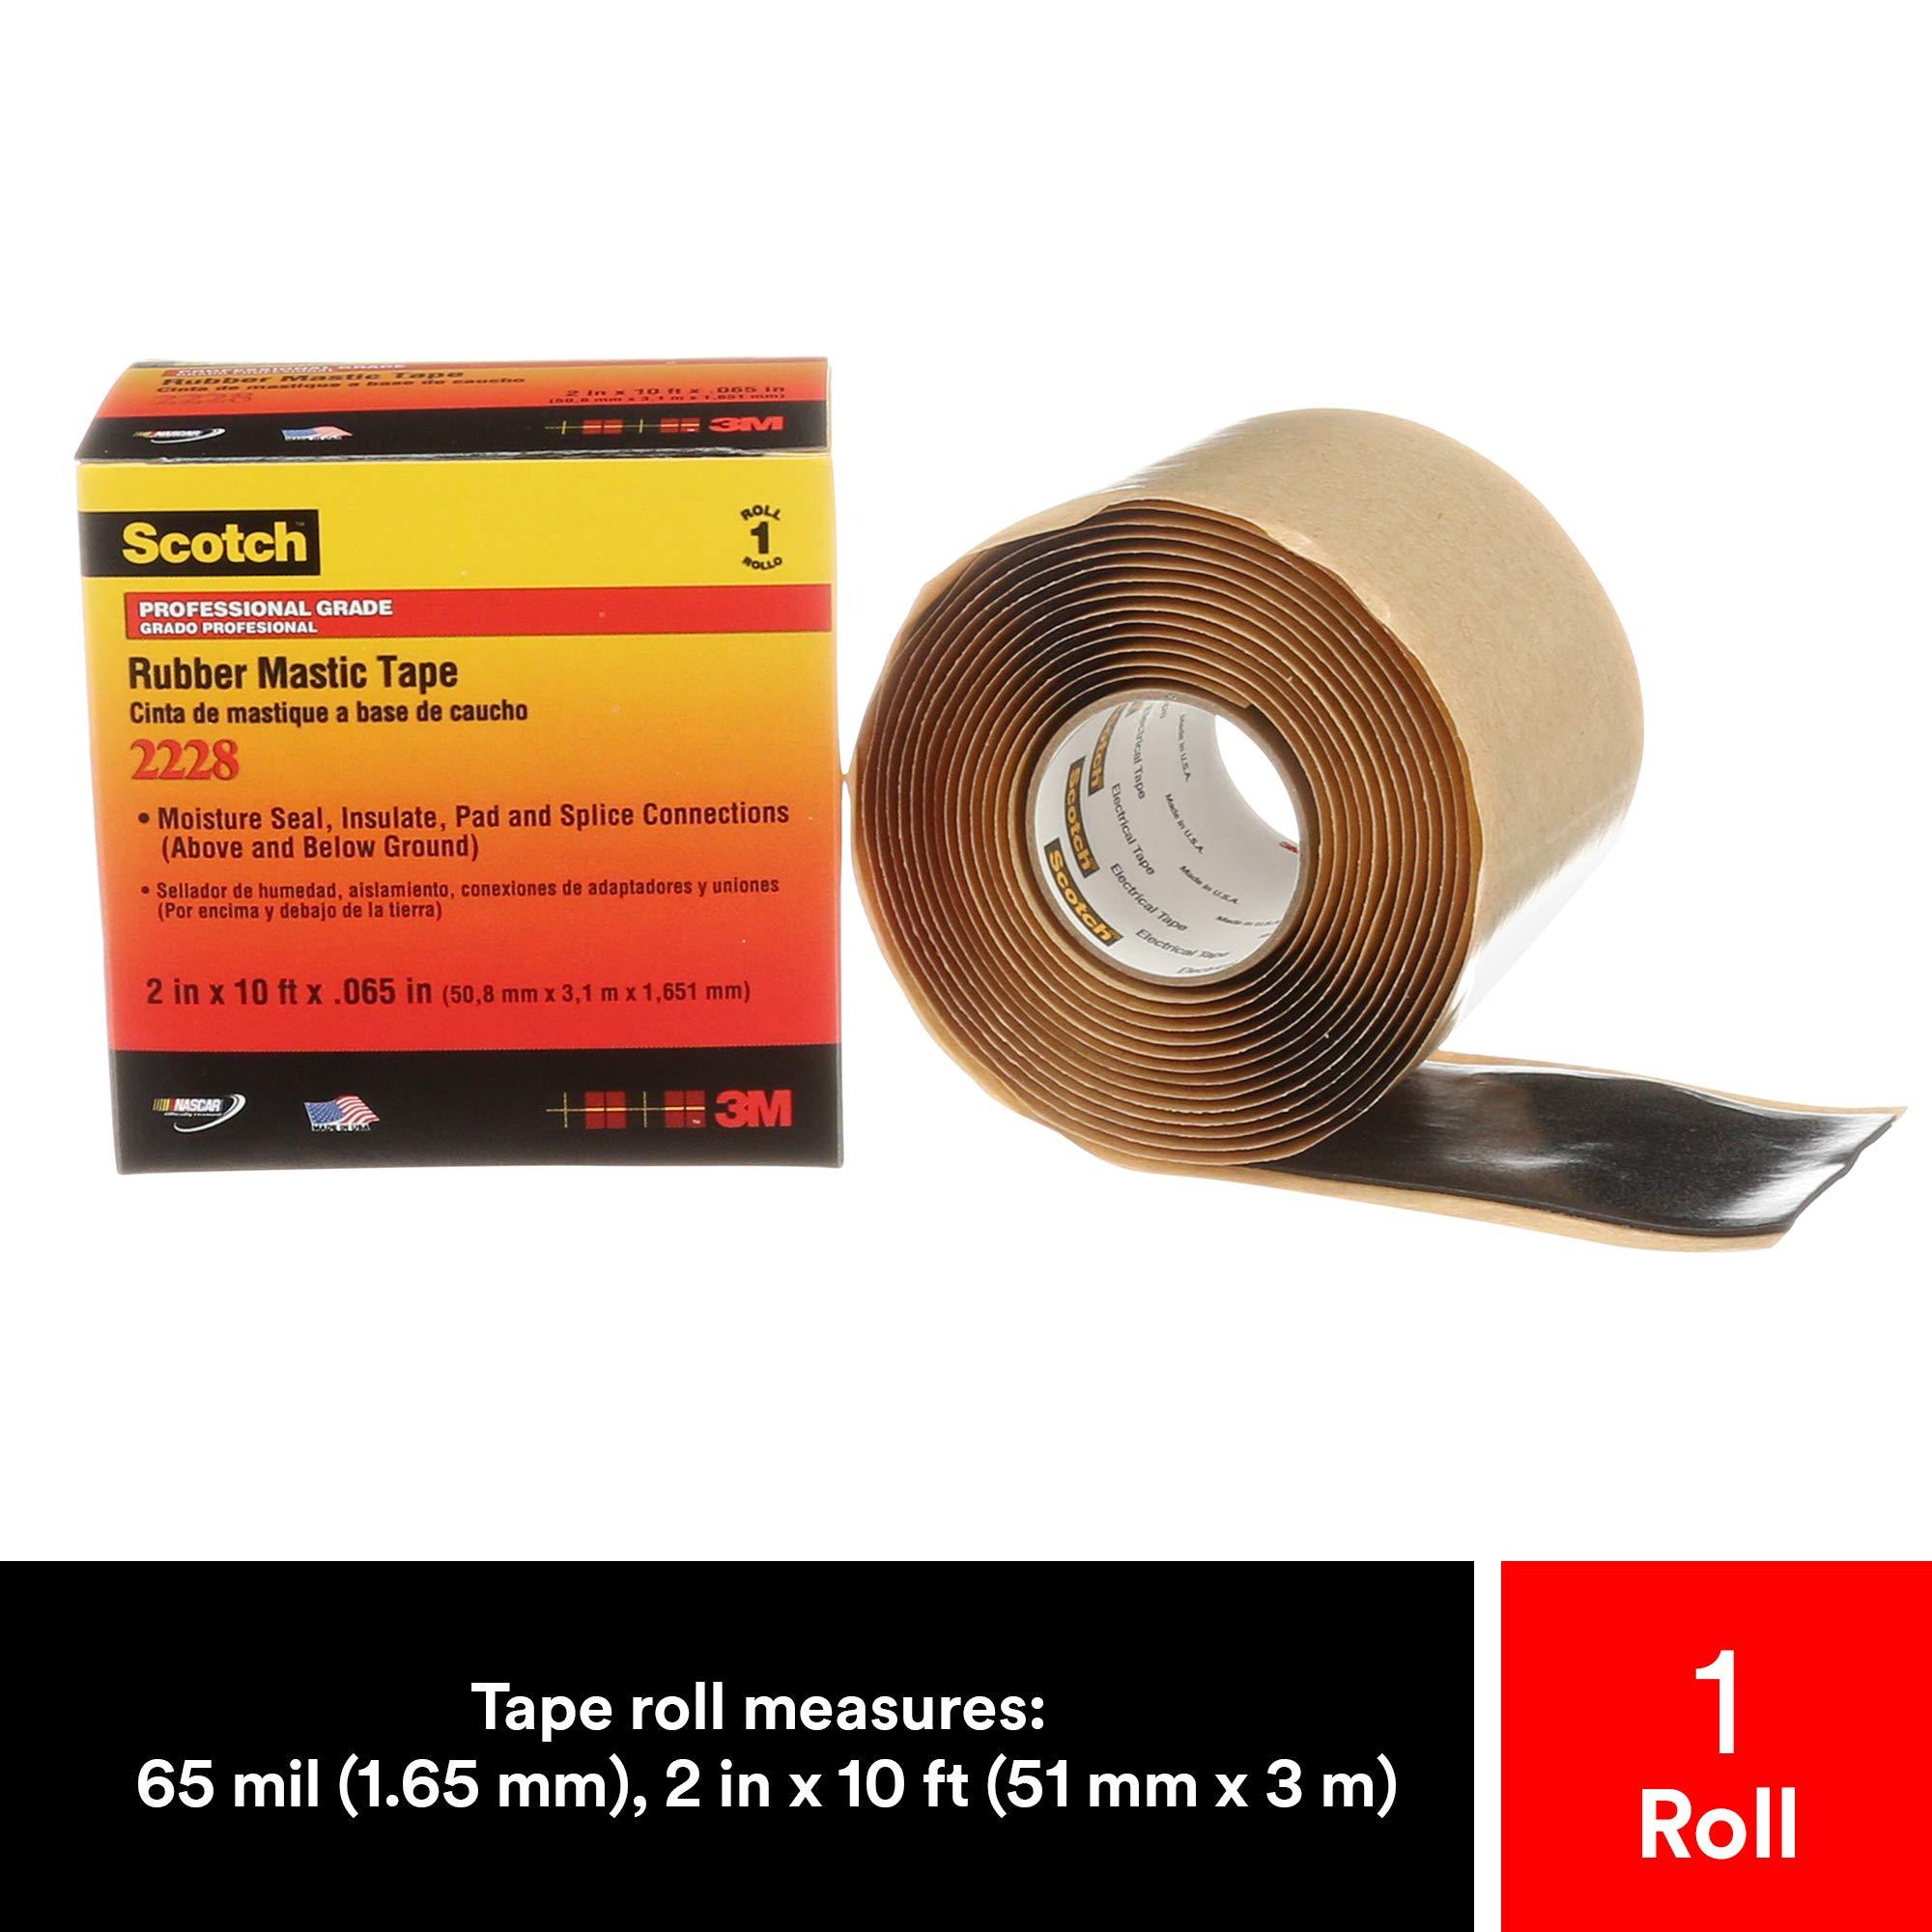 3M 2228 Scotch Moisture Sealing Electrical Tape 1 in x 10 ft x 0.65 in